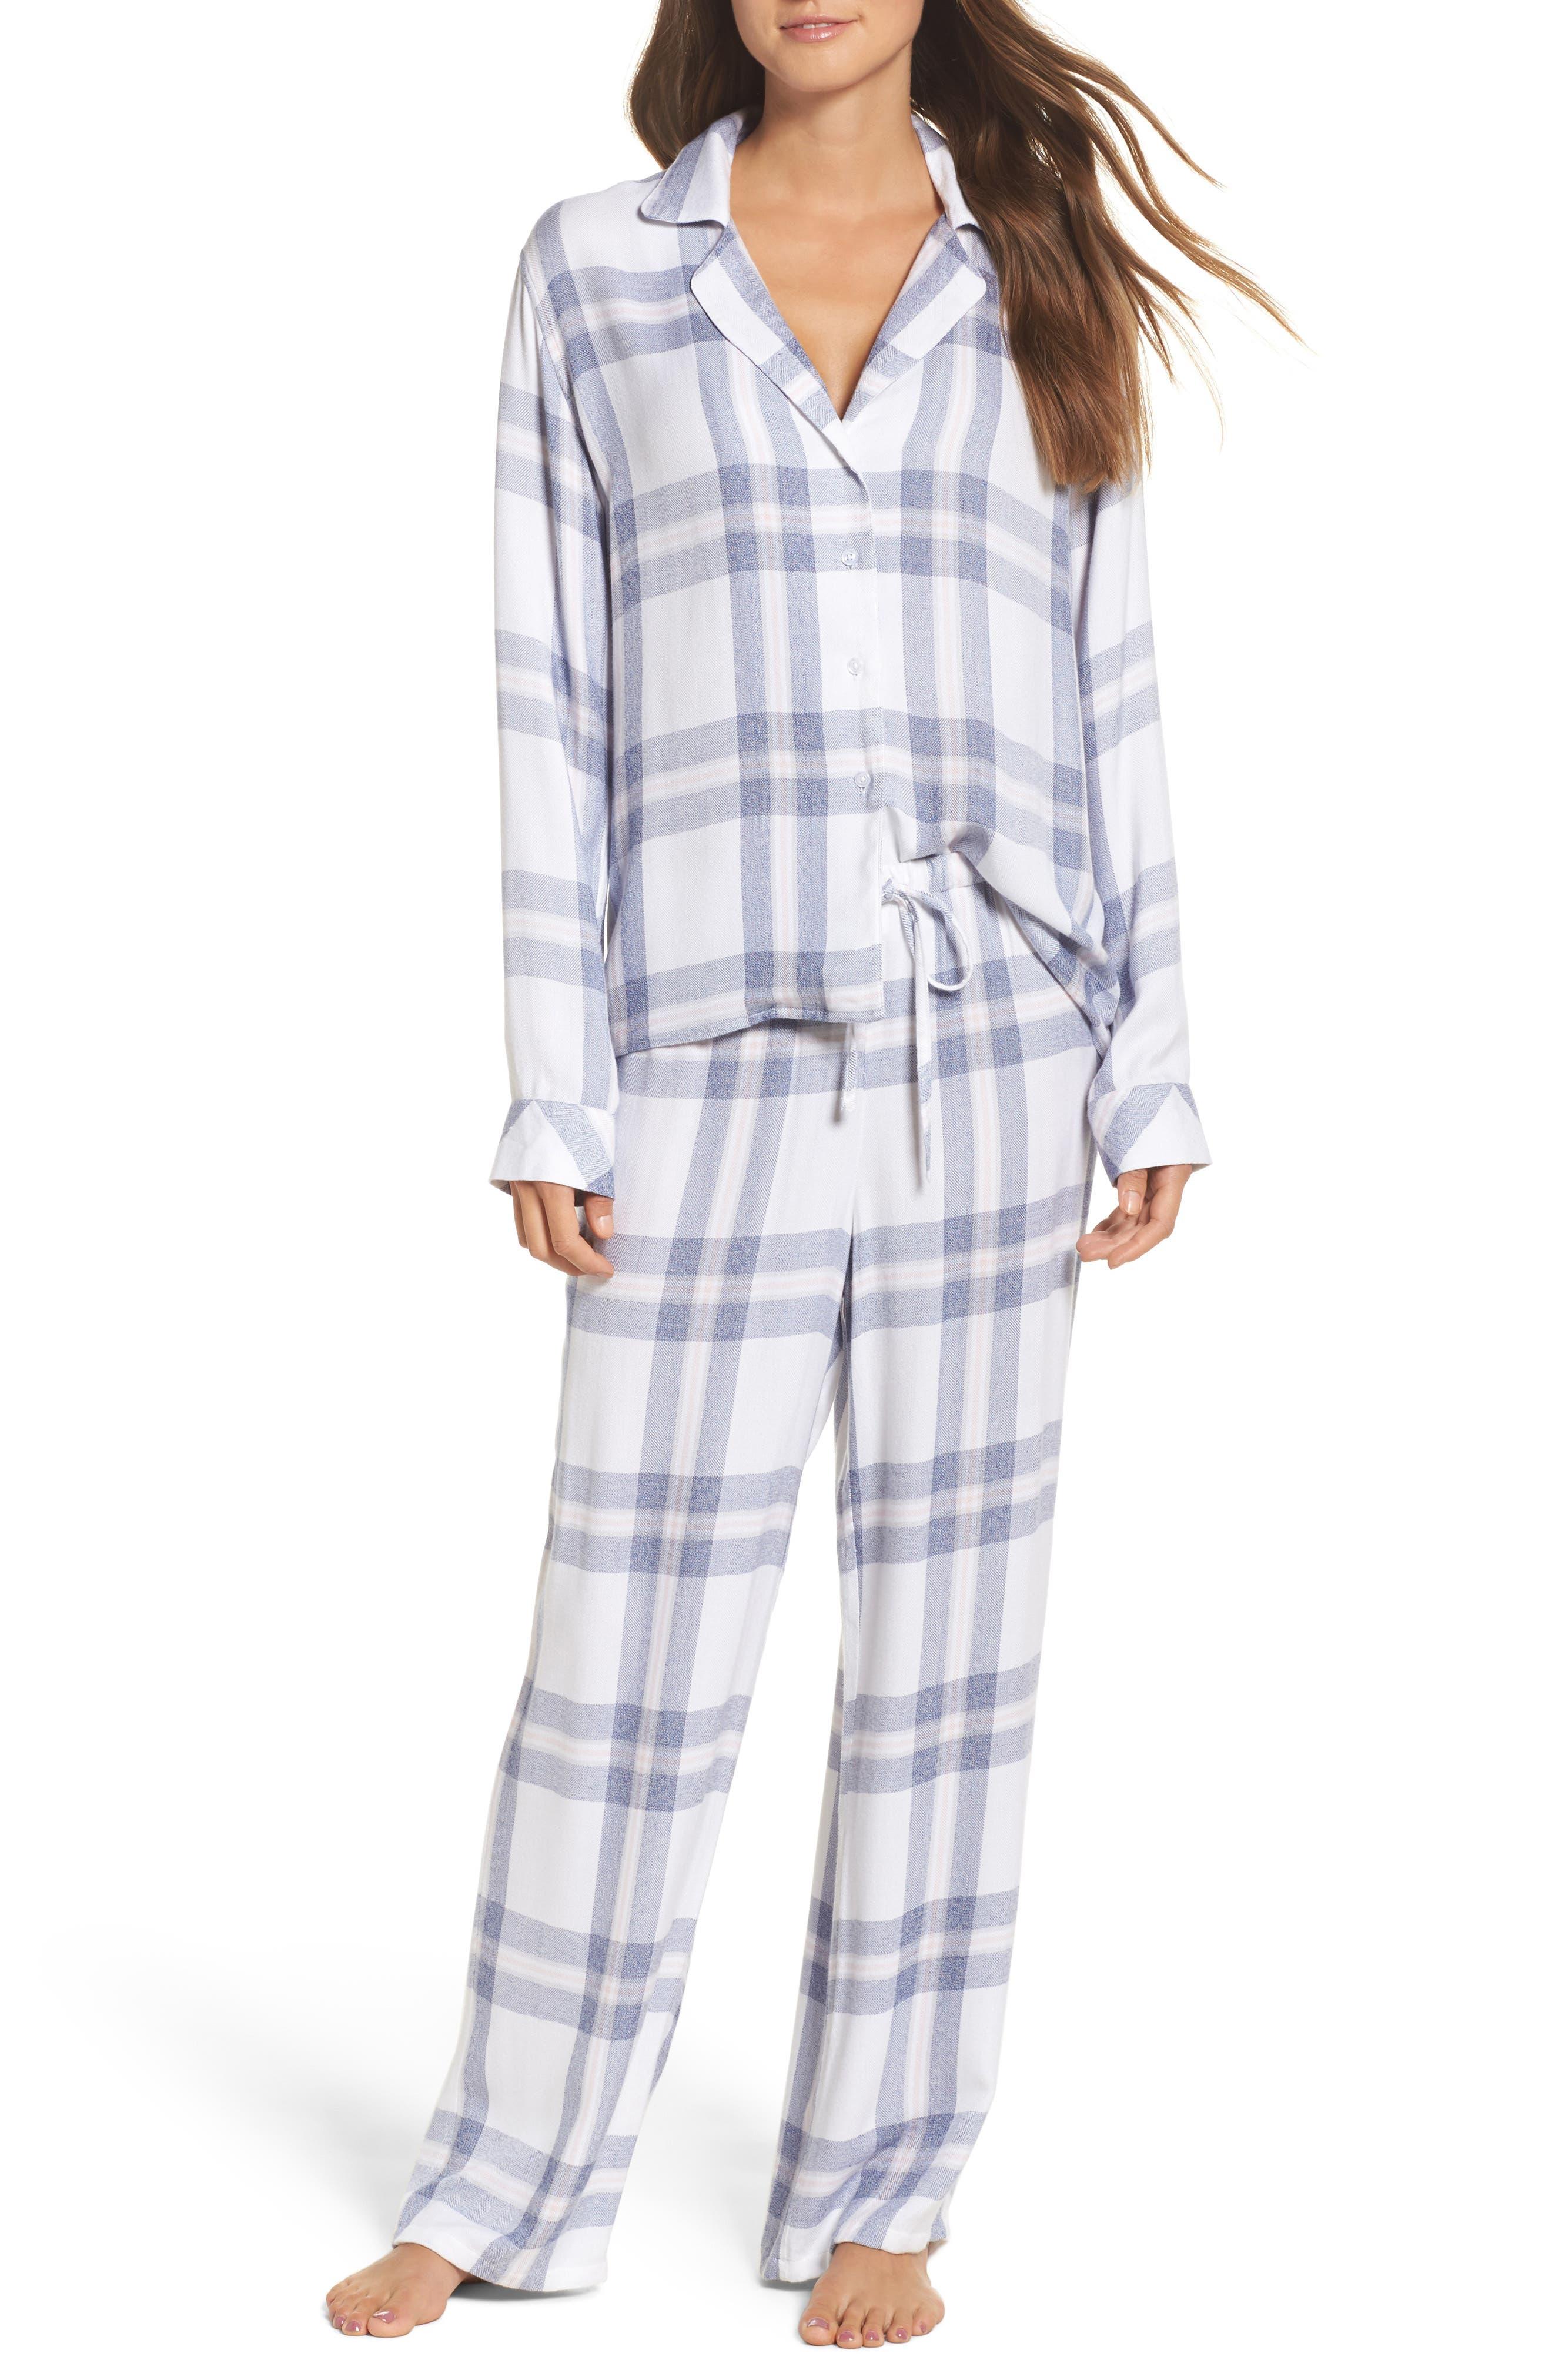 Plaid Pajamas,                         Main,                         color, WHITE/ CHAMBRAY/ PETAL